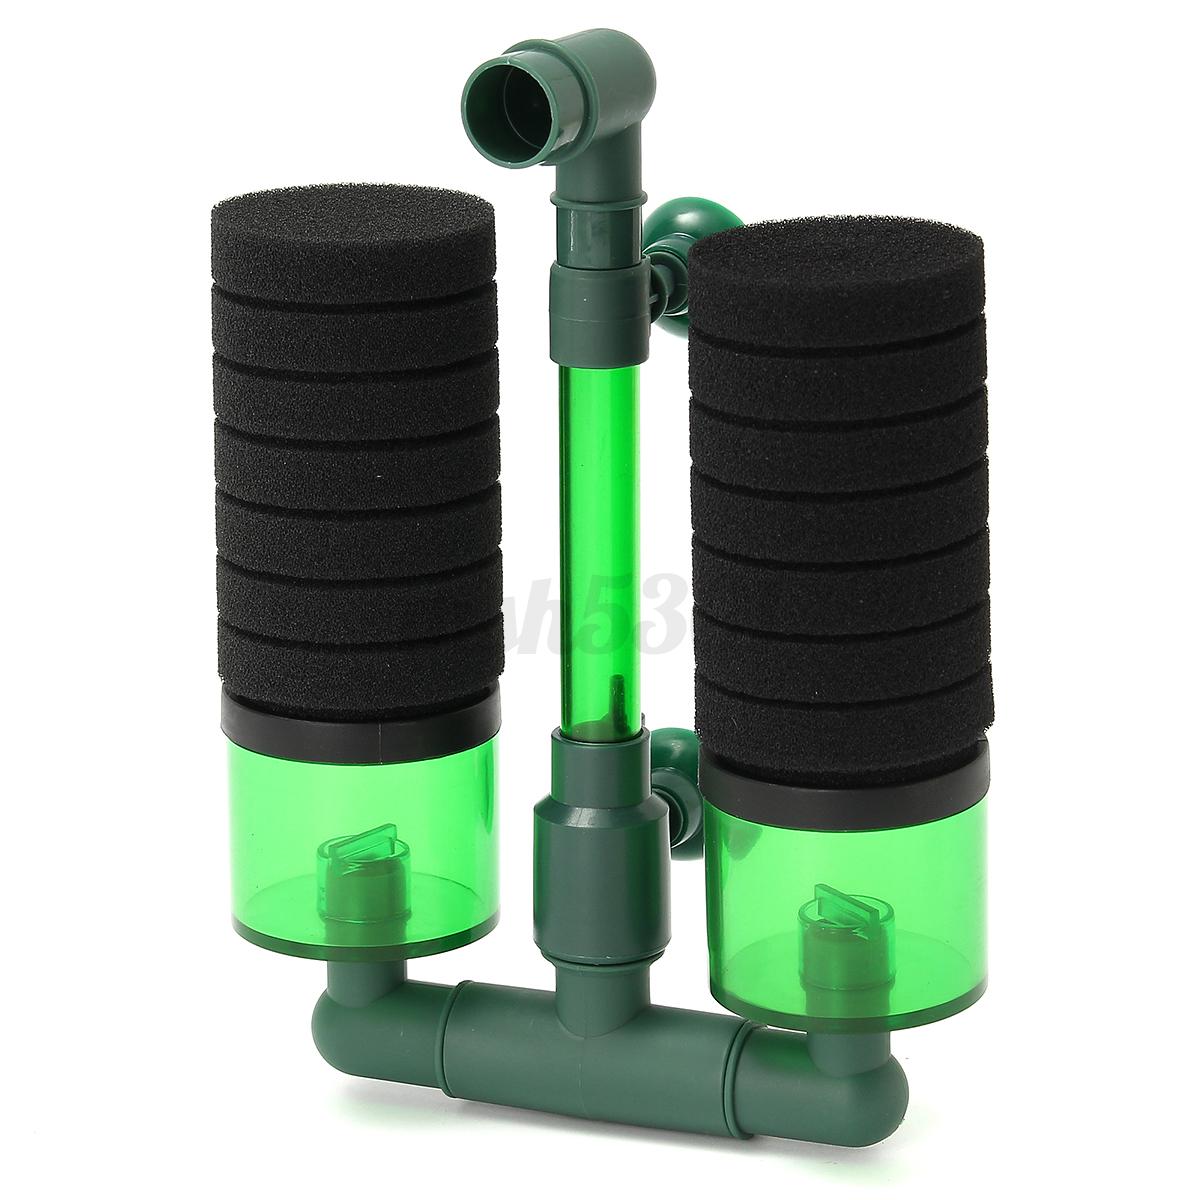 Biochemical-Bio-Sponge-Foam-Filter-Fry-Aquarium-Fish-Tank-Air-Pump-Double-Head